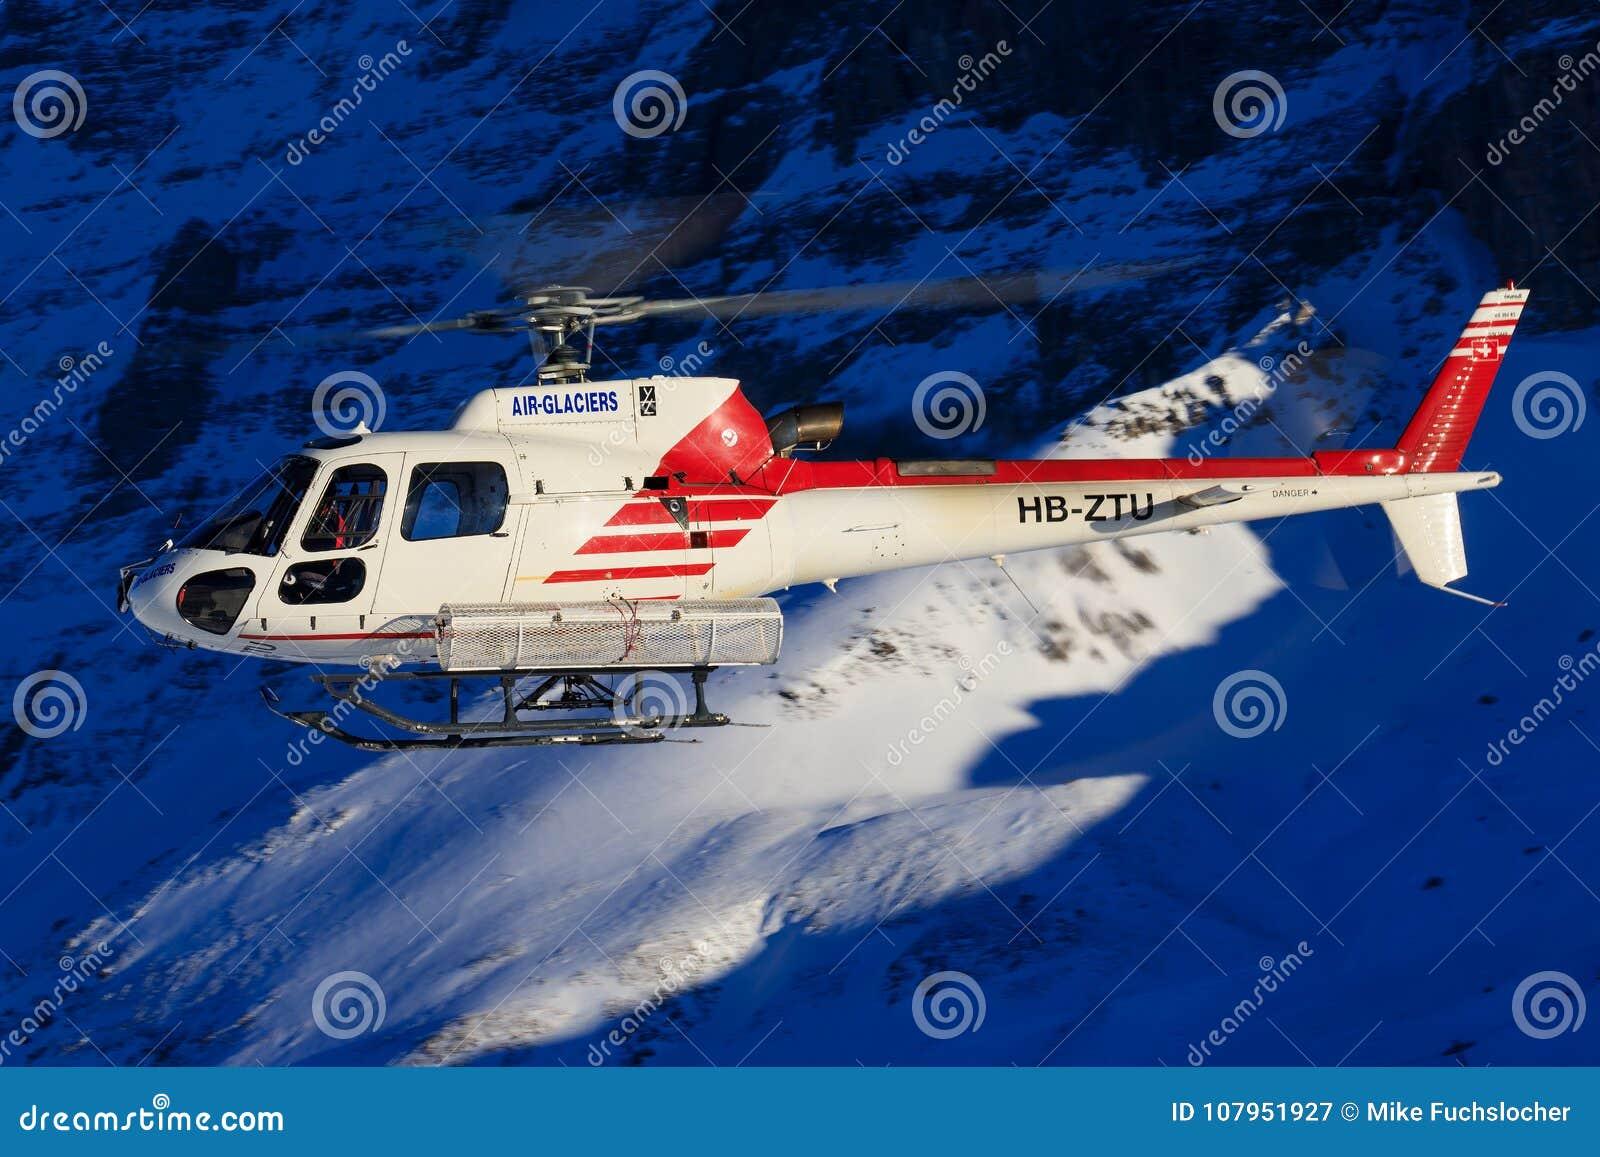 Hb-ZNJ AS350B3 door swissheli